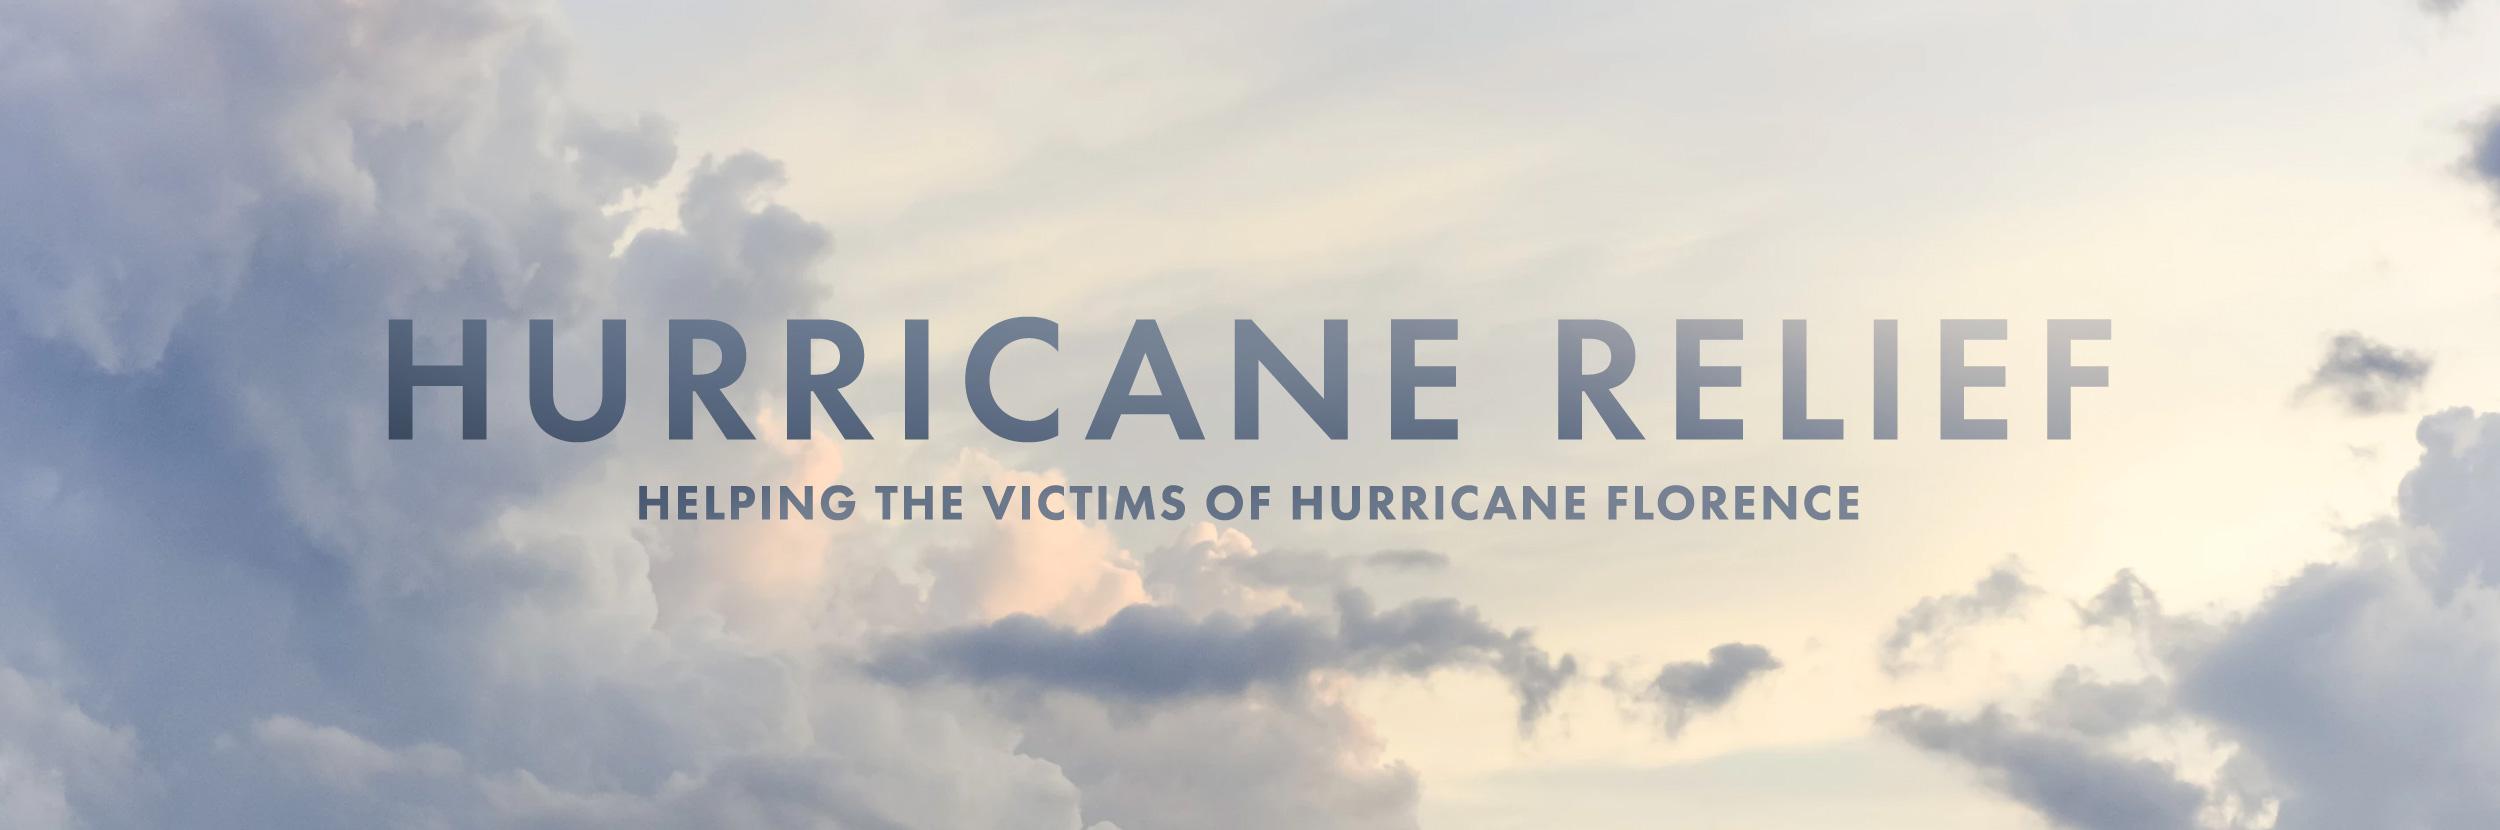 2018-hurricane-relief.jpg